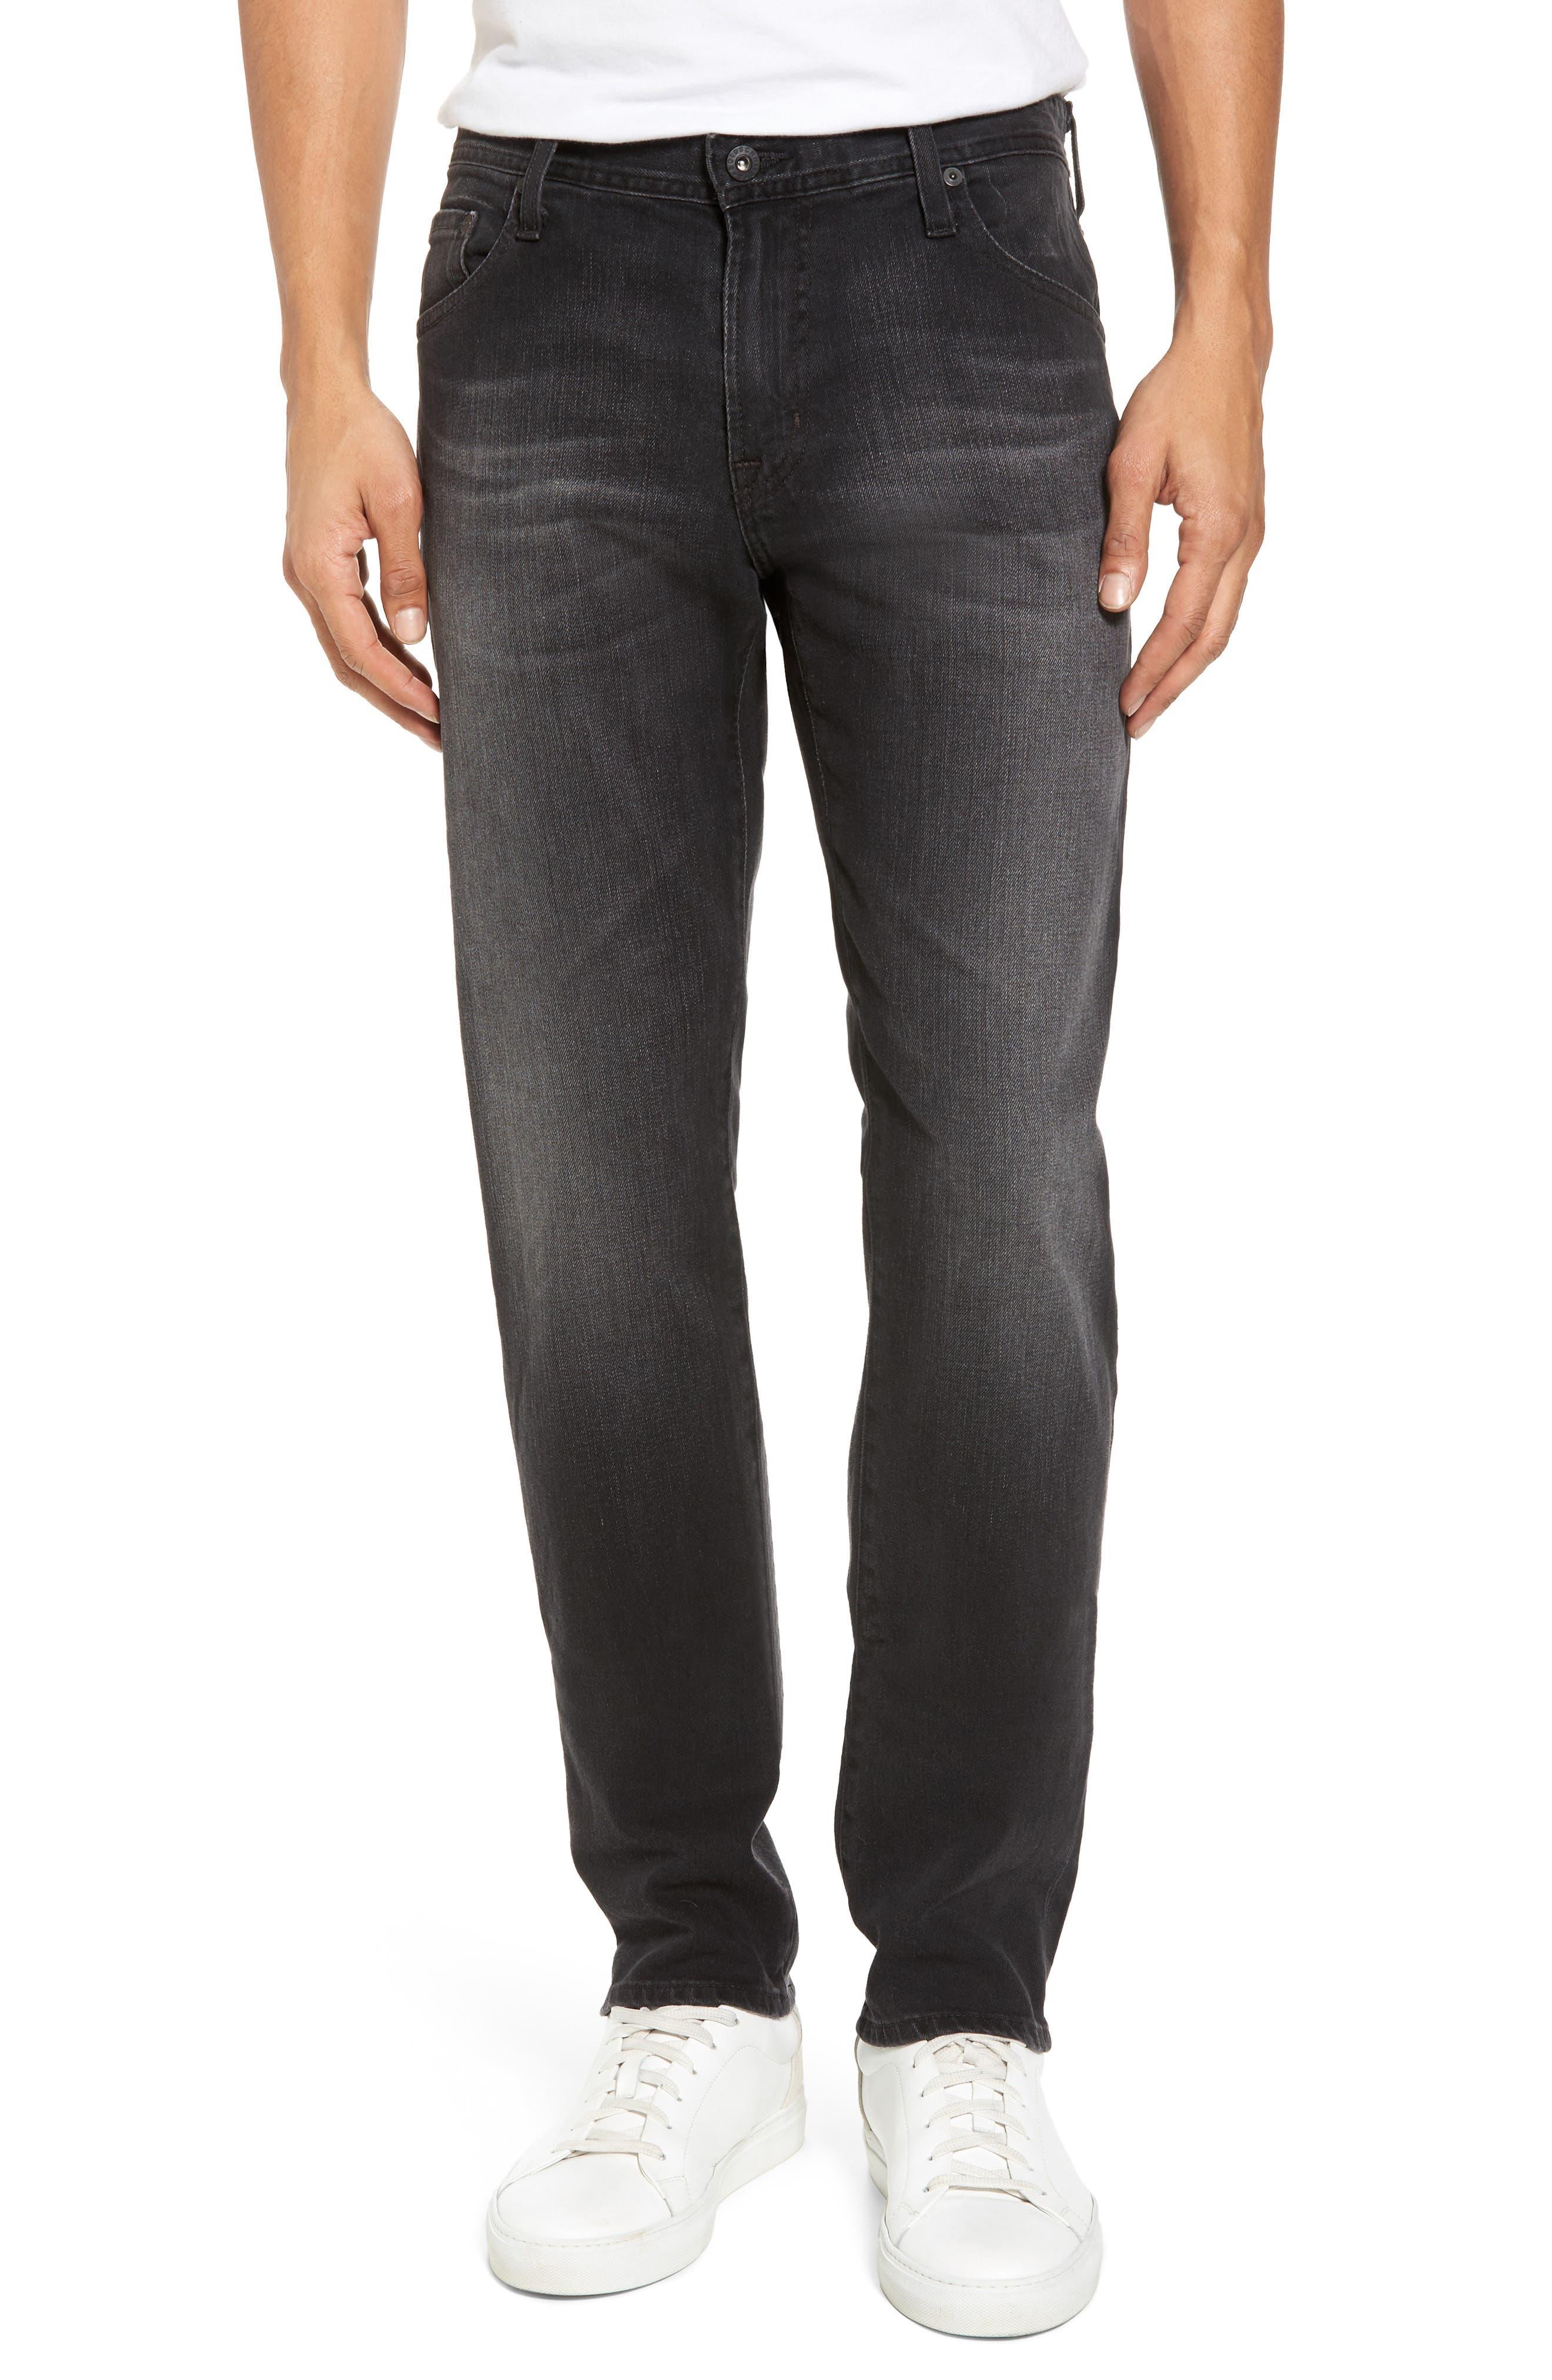 Tellis Modern Slim Fit Jeans,                             Main thumbnail 1, color,                             019